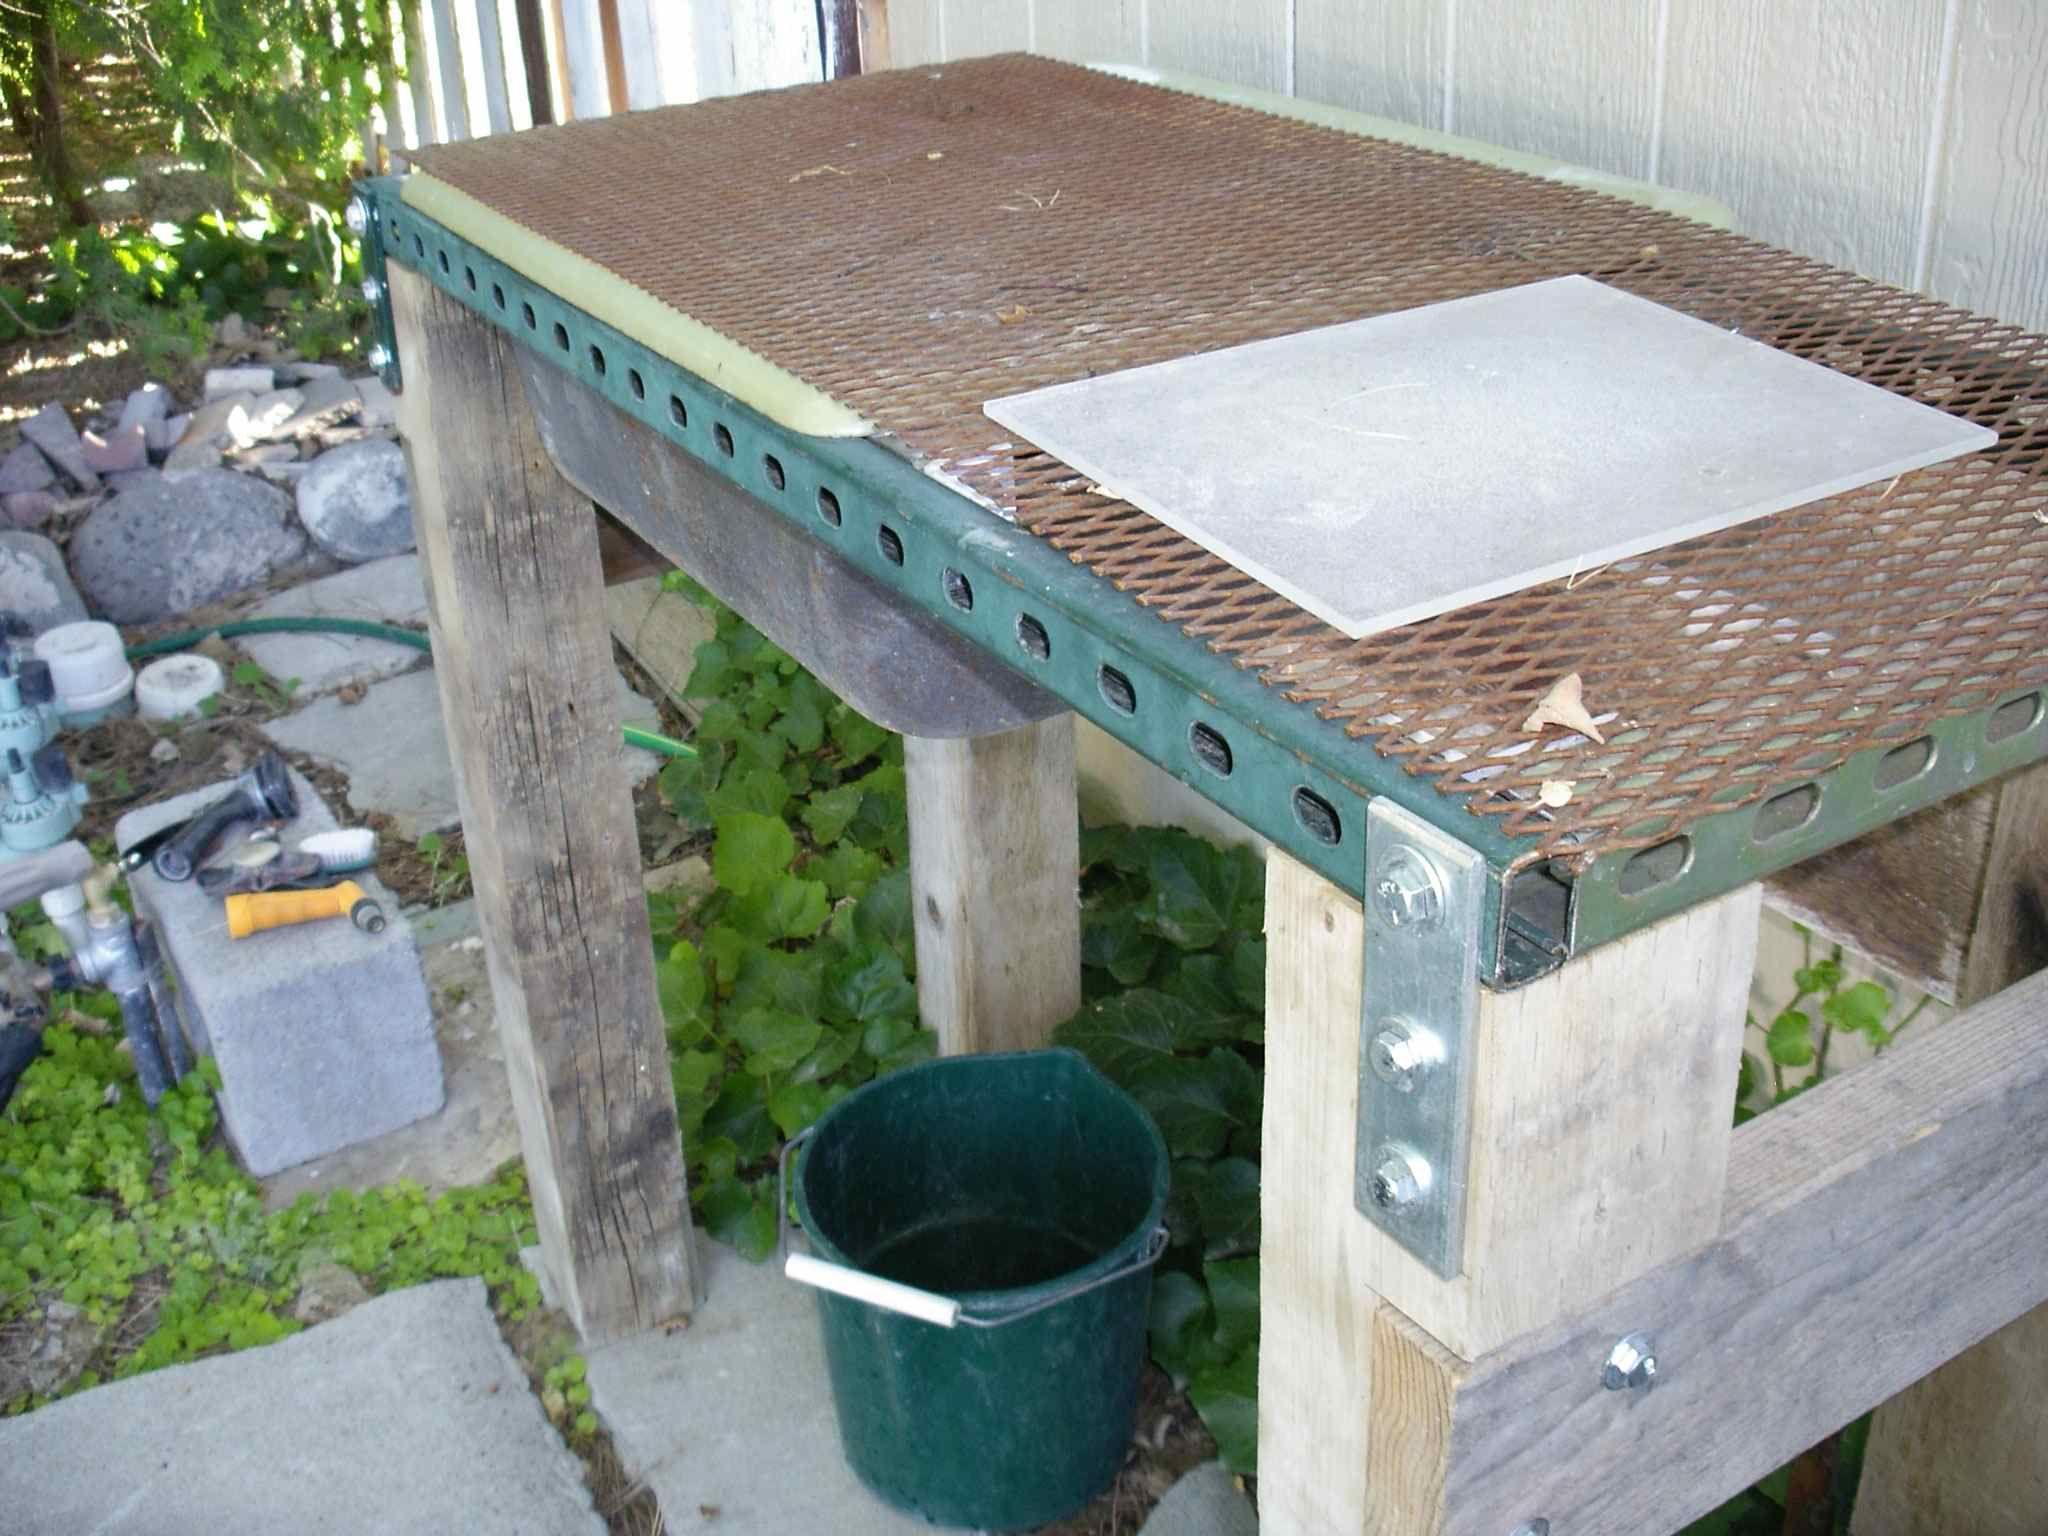 Ye Olde Sink In The Garden Garden Sink Outdoor Garden Sink